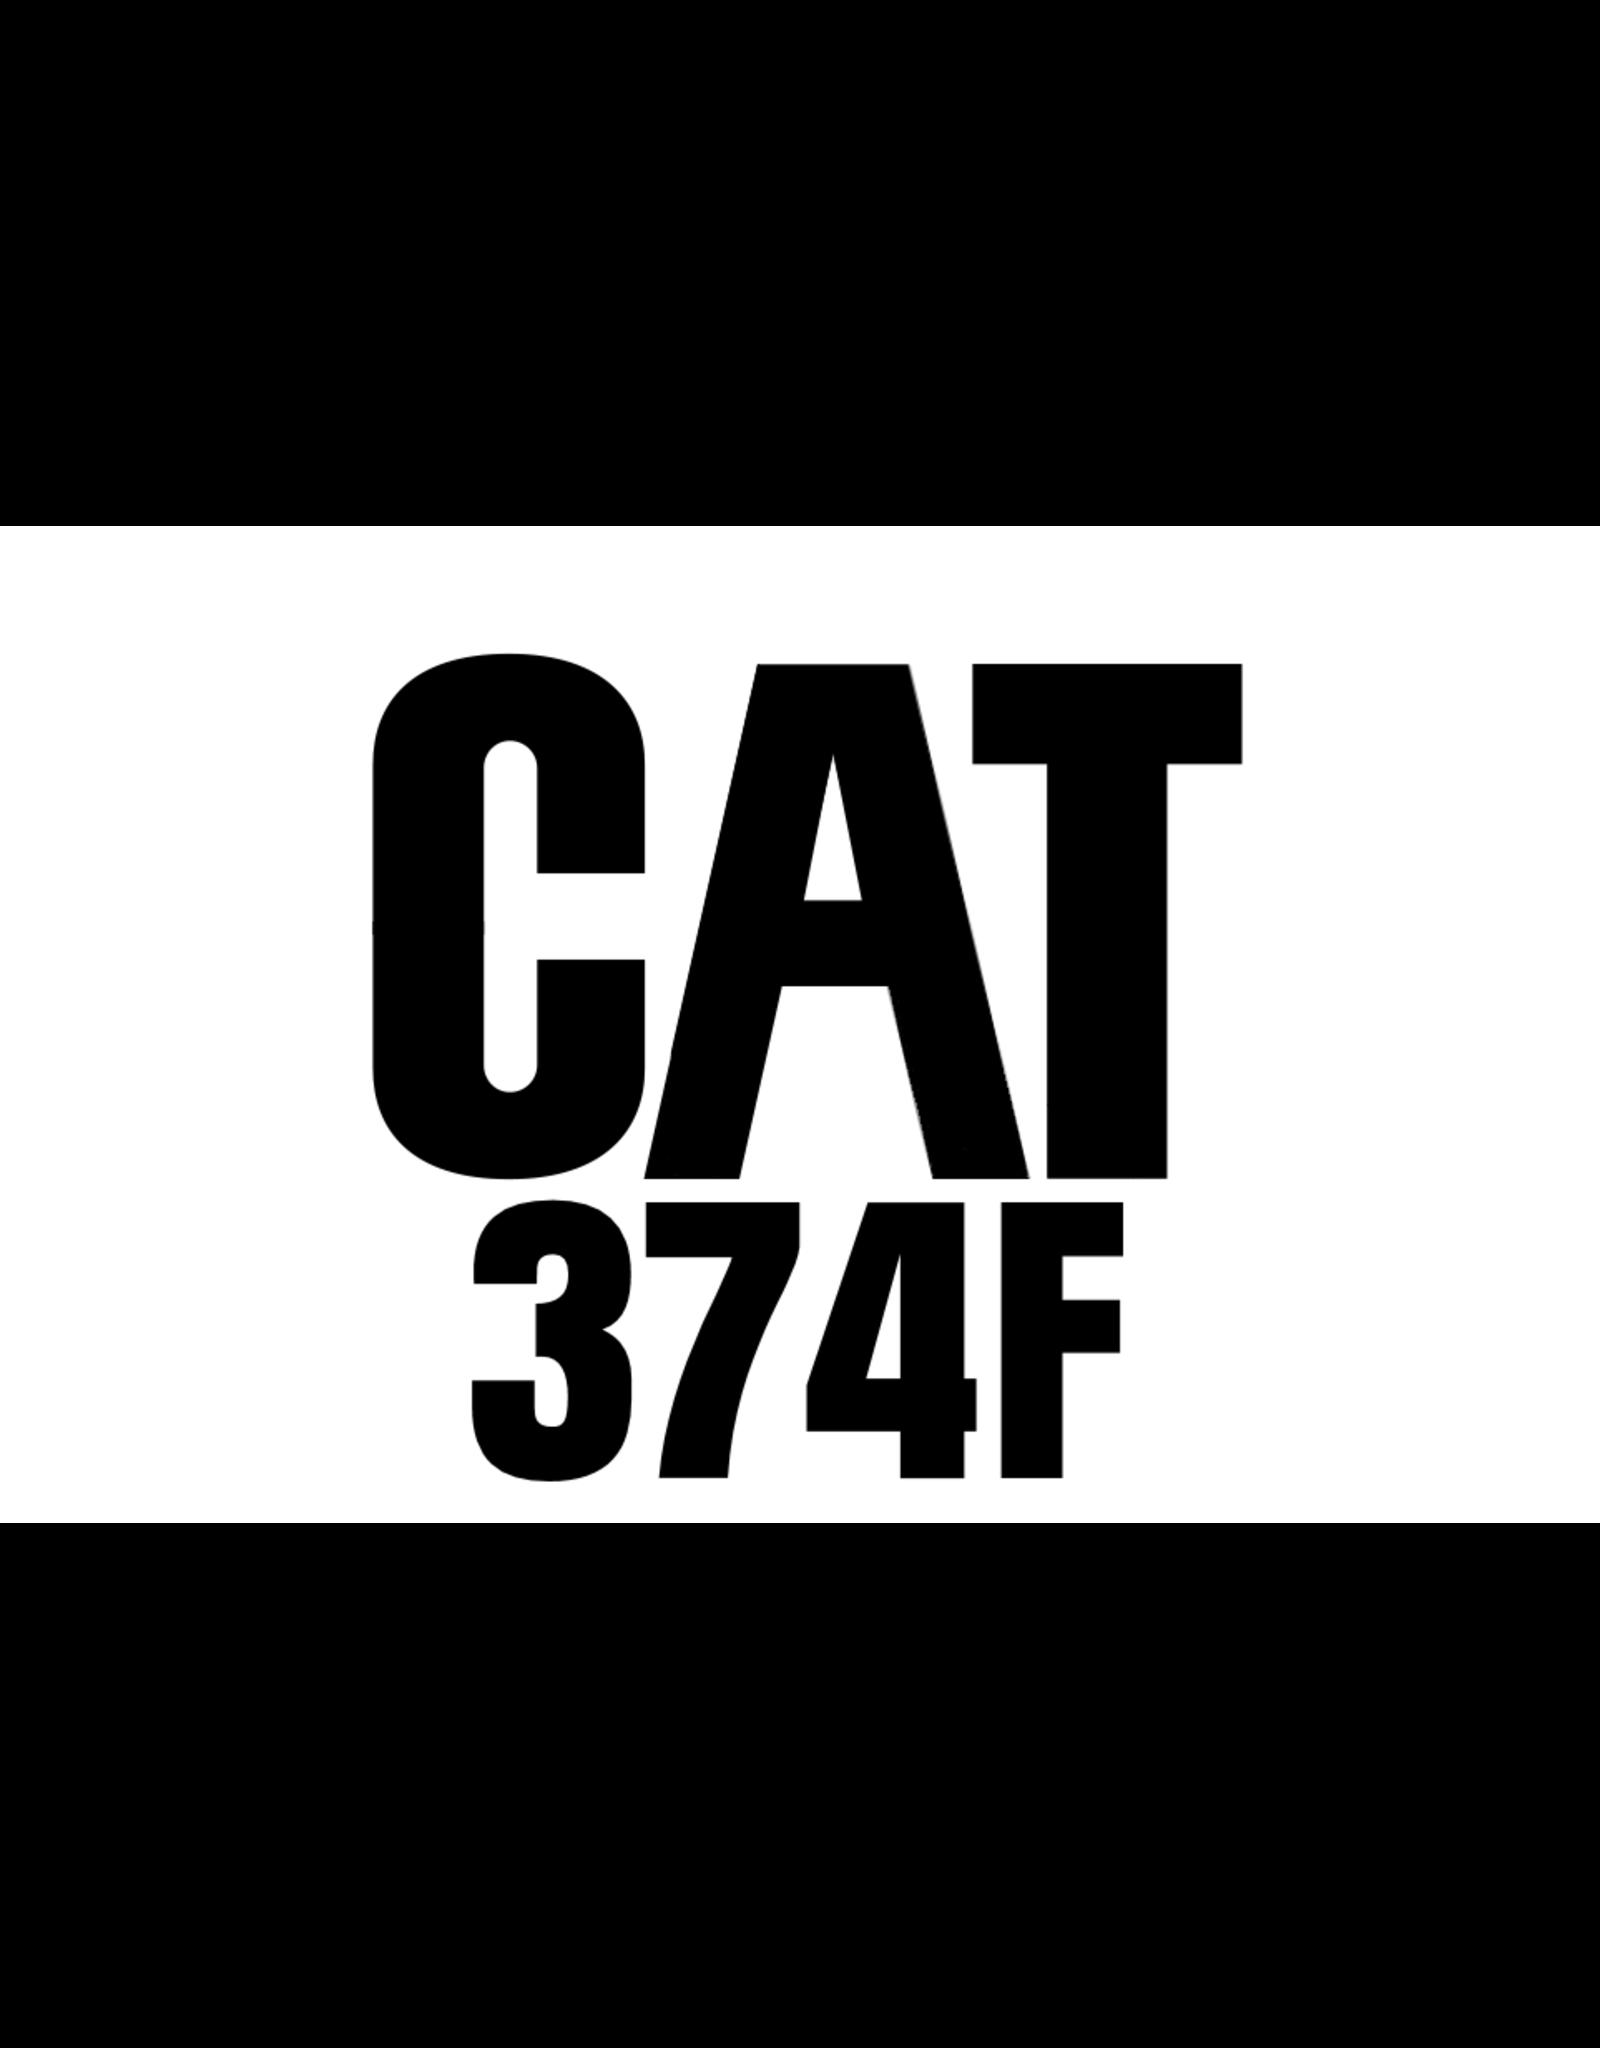 Echle Hartstahl GmbH FOPS for CAT 374F